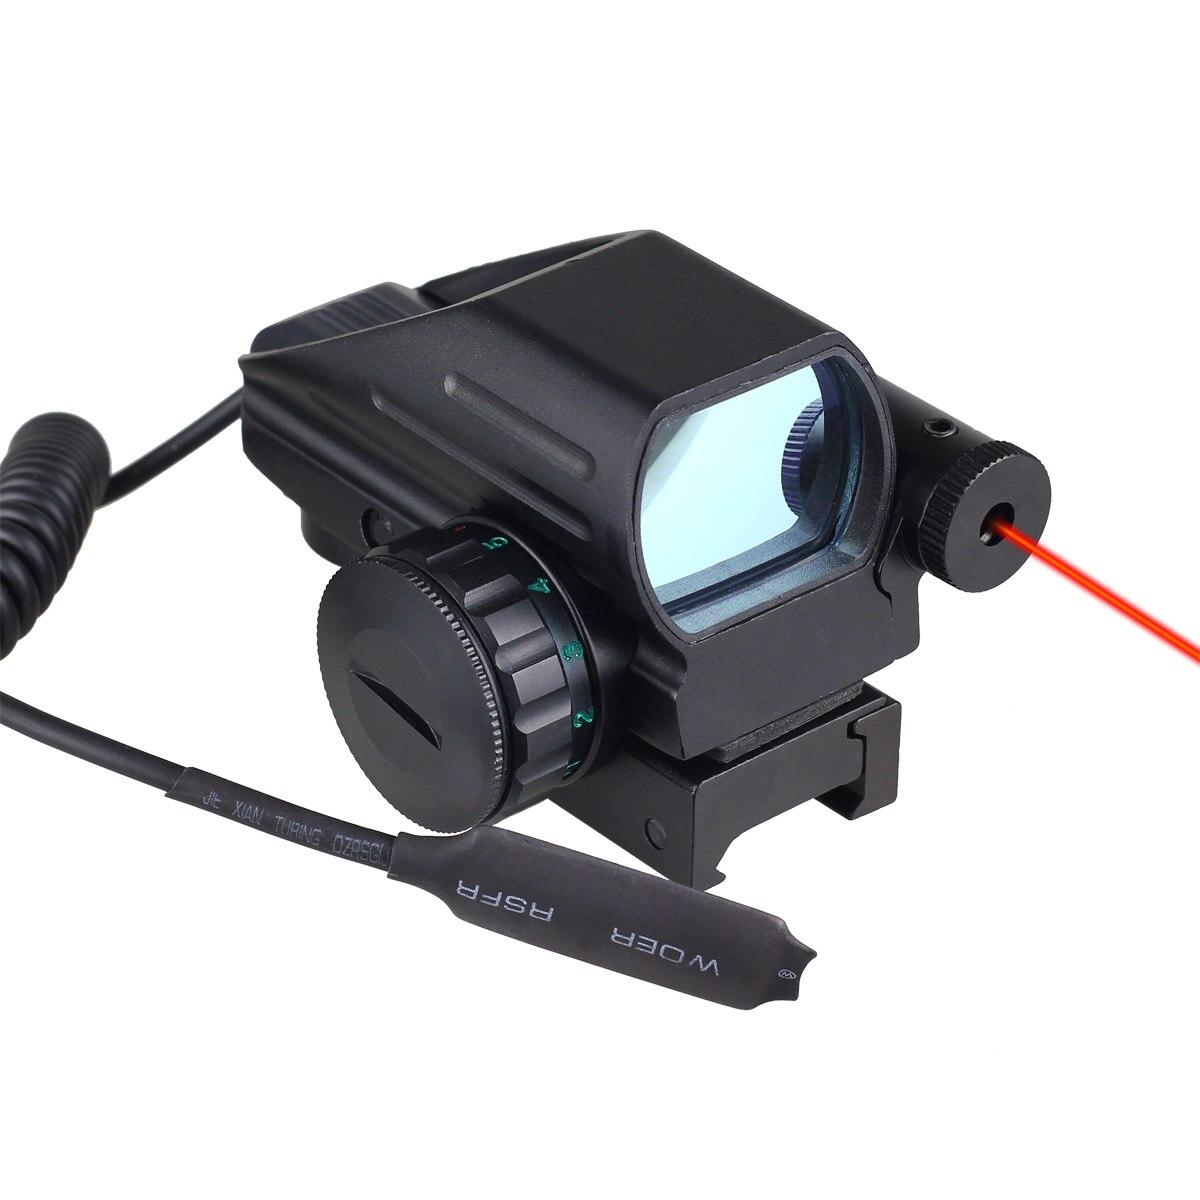 Holographic Laser Sight Scope 4 Reflex Red Green Dot Retículo Rifle Picatinny Rail 20mm para AR 12ga Shotgun Airsoft caça